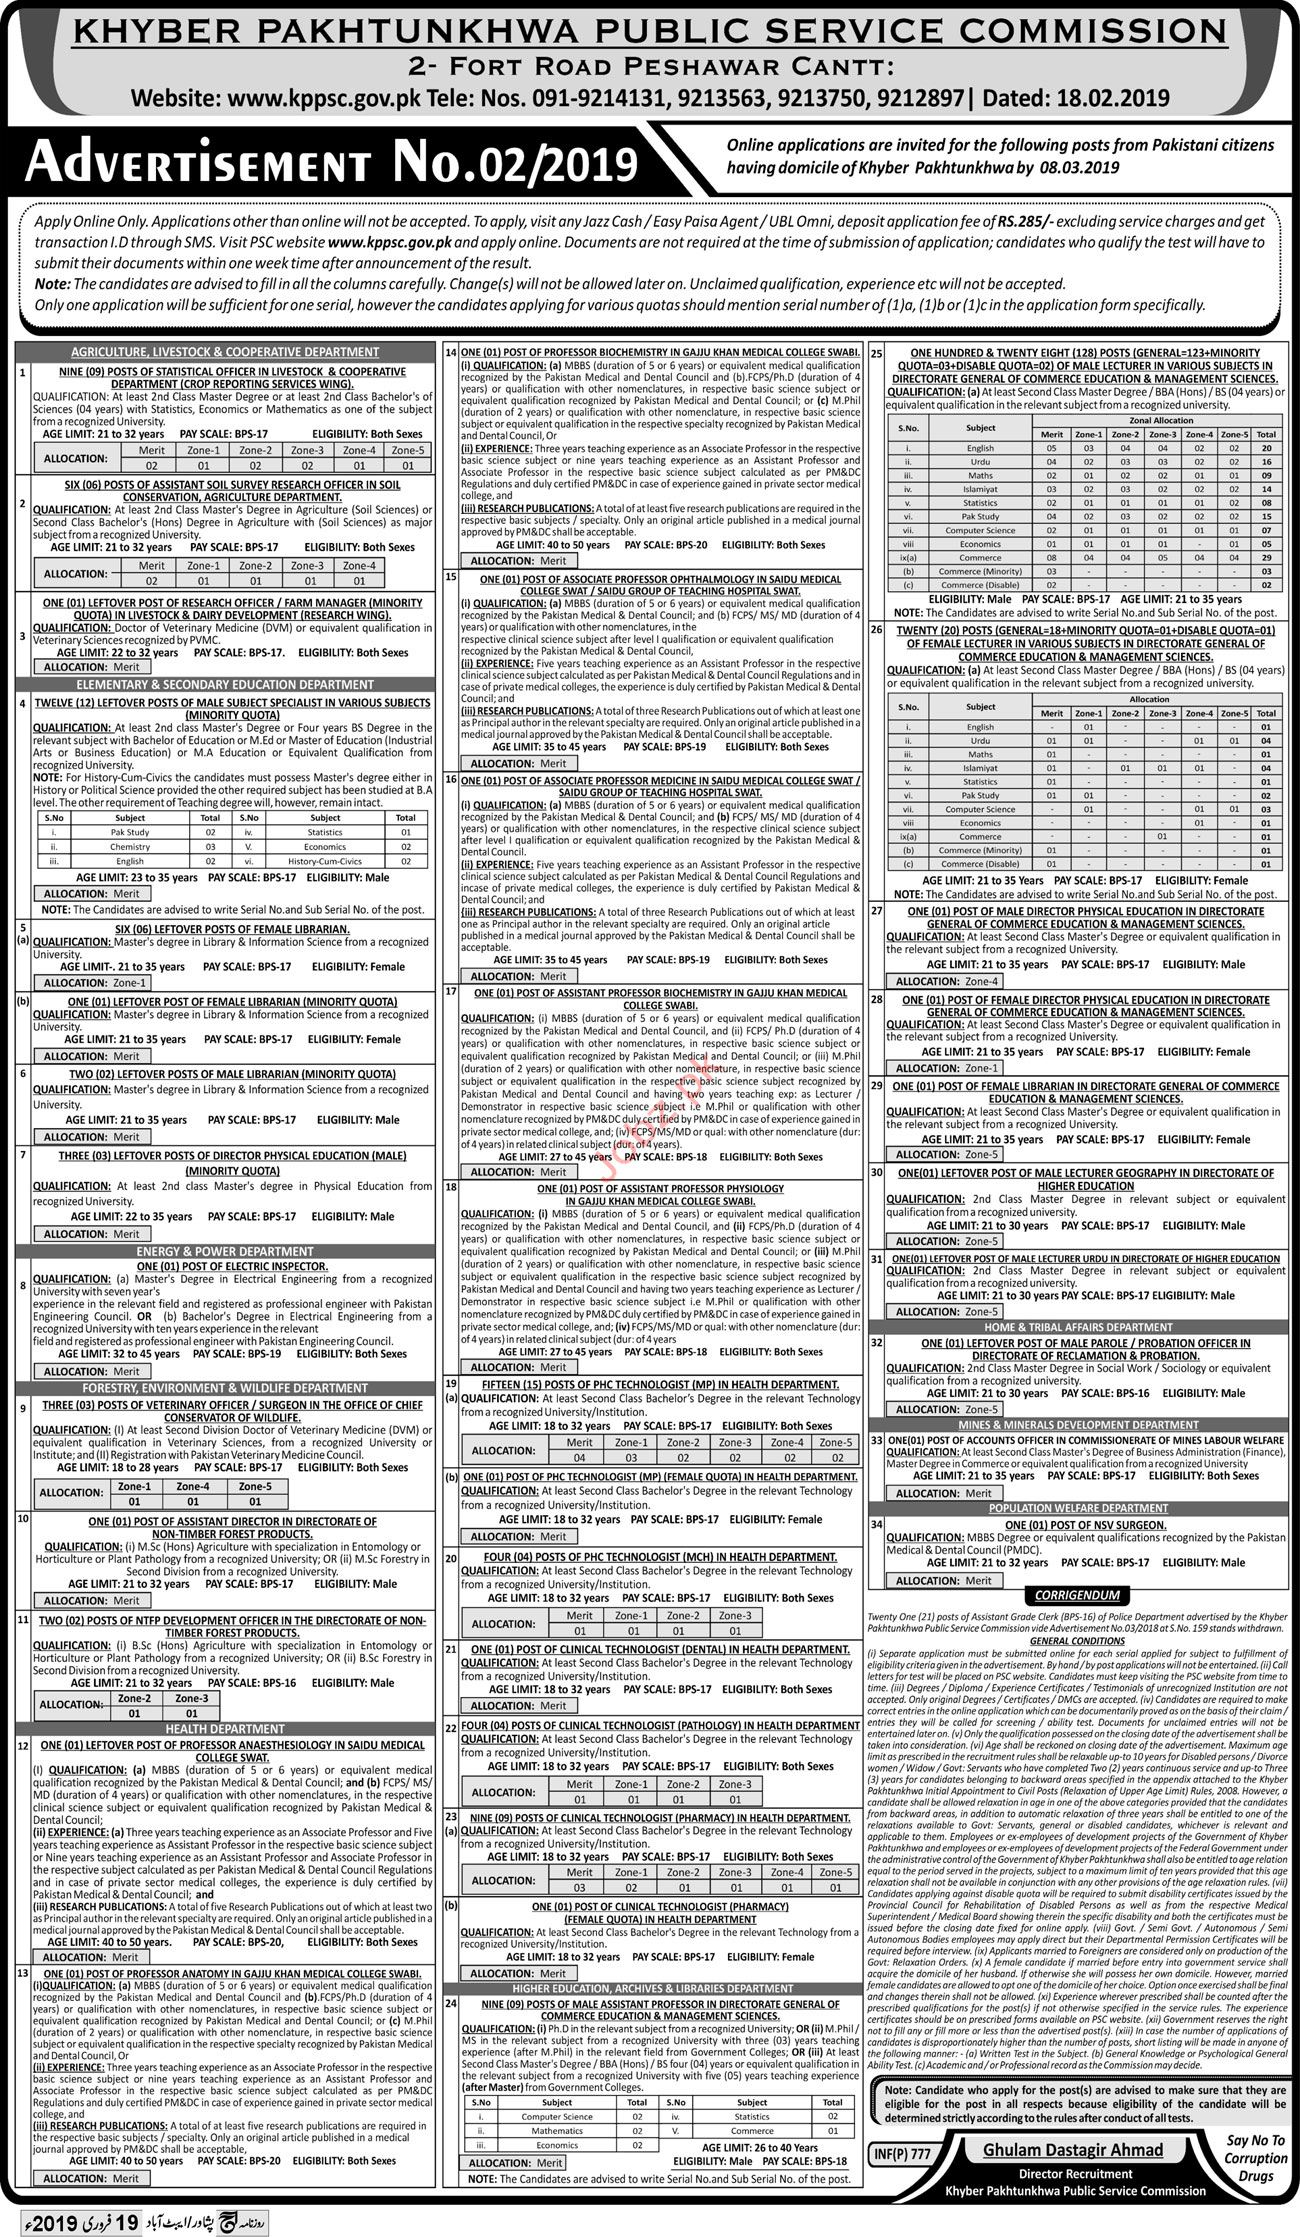 Khyber Pakhtunkhwa Public Service Commission KPPSC Jobs 2019